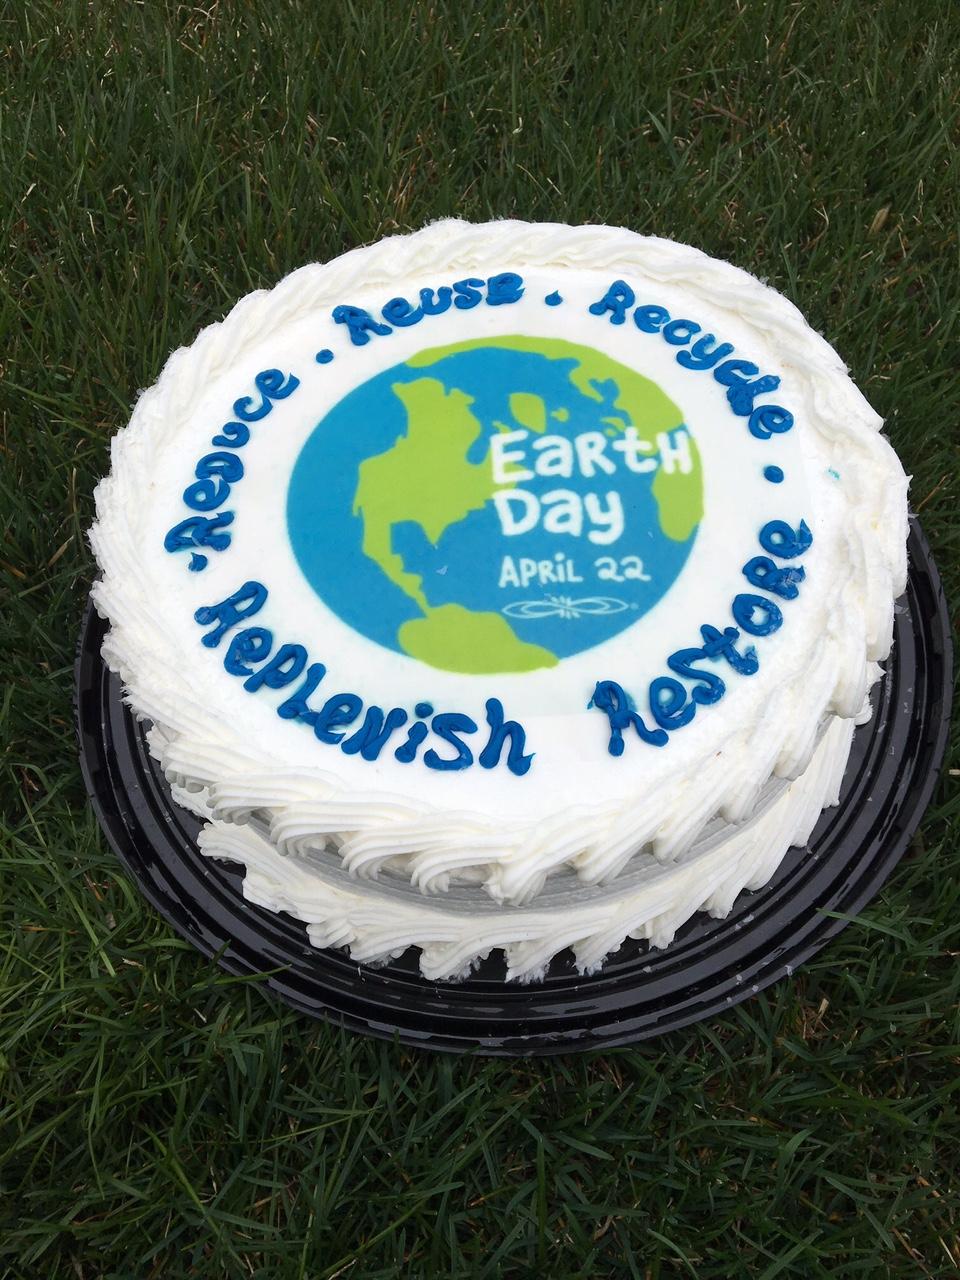 Happy Birthday Earth Day cake